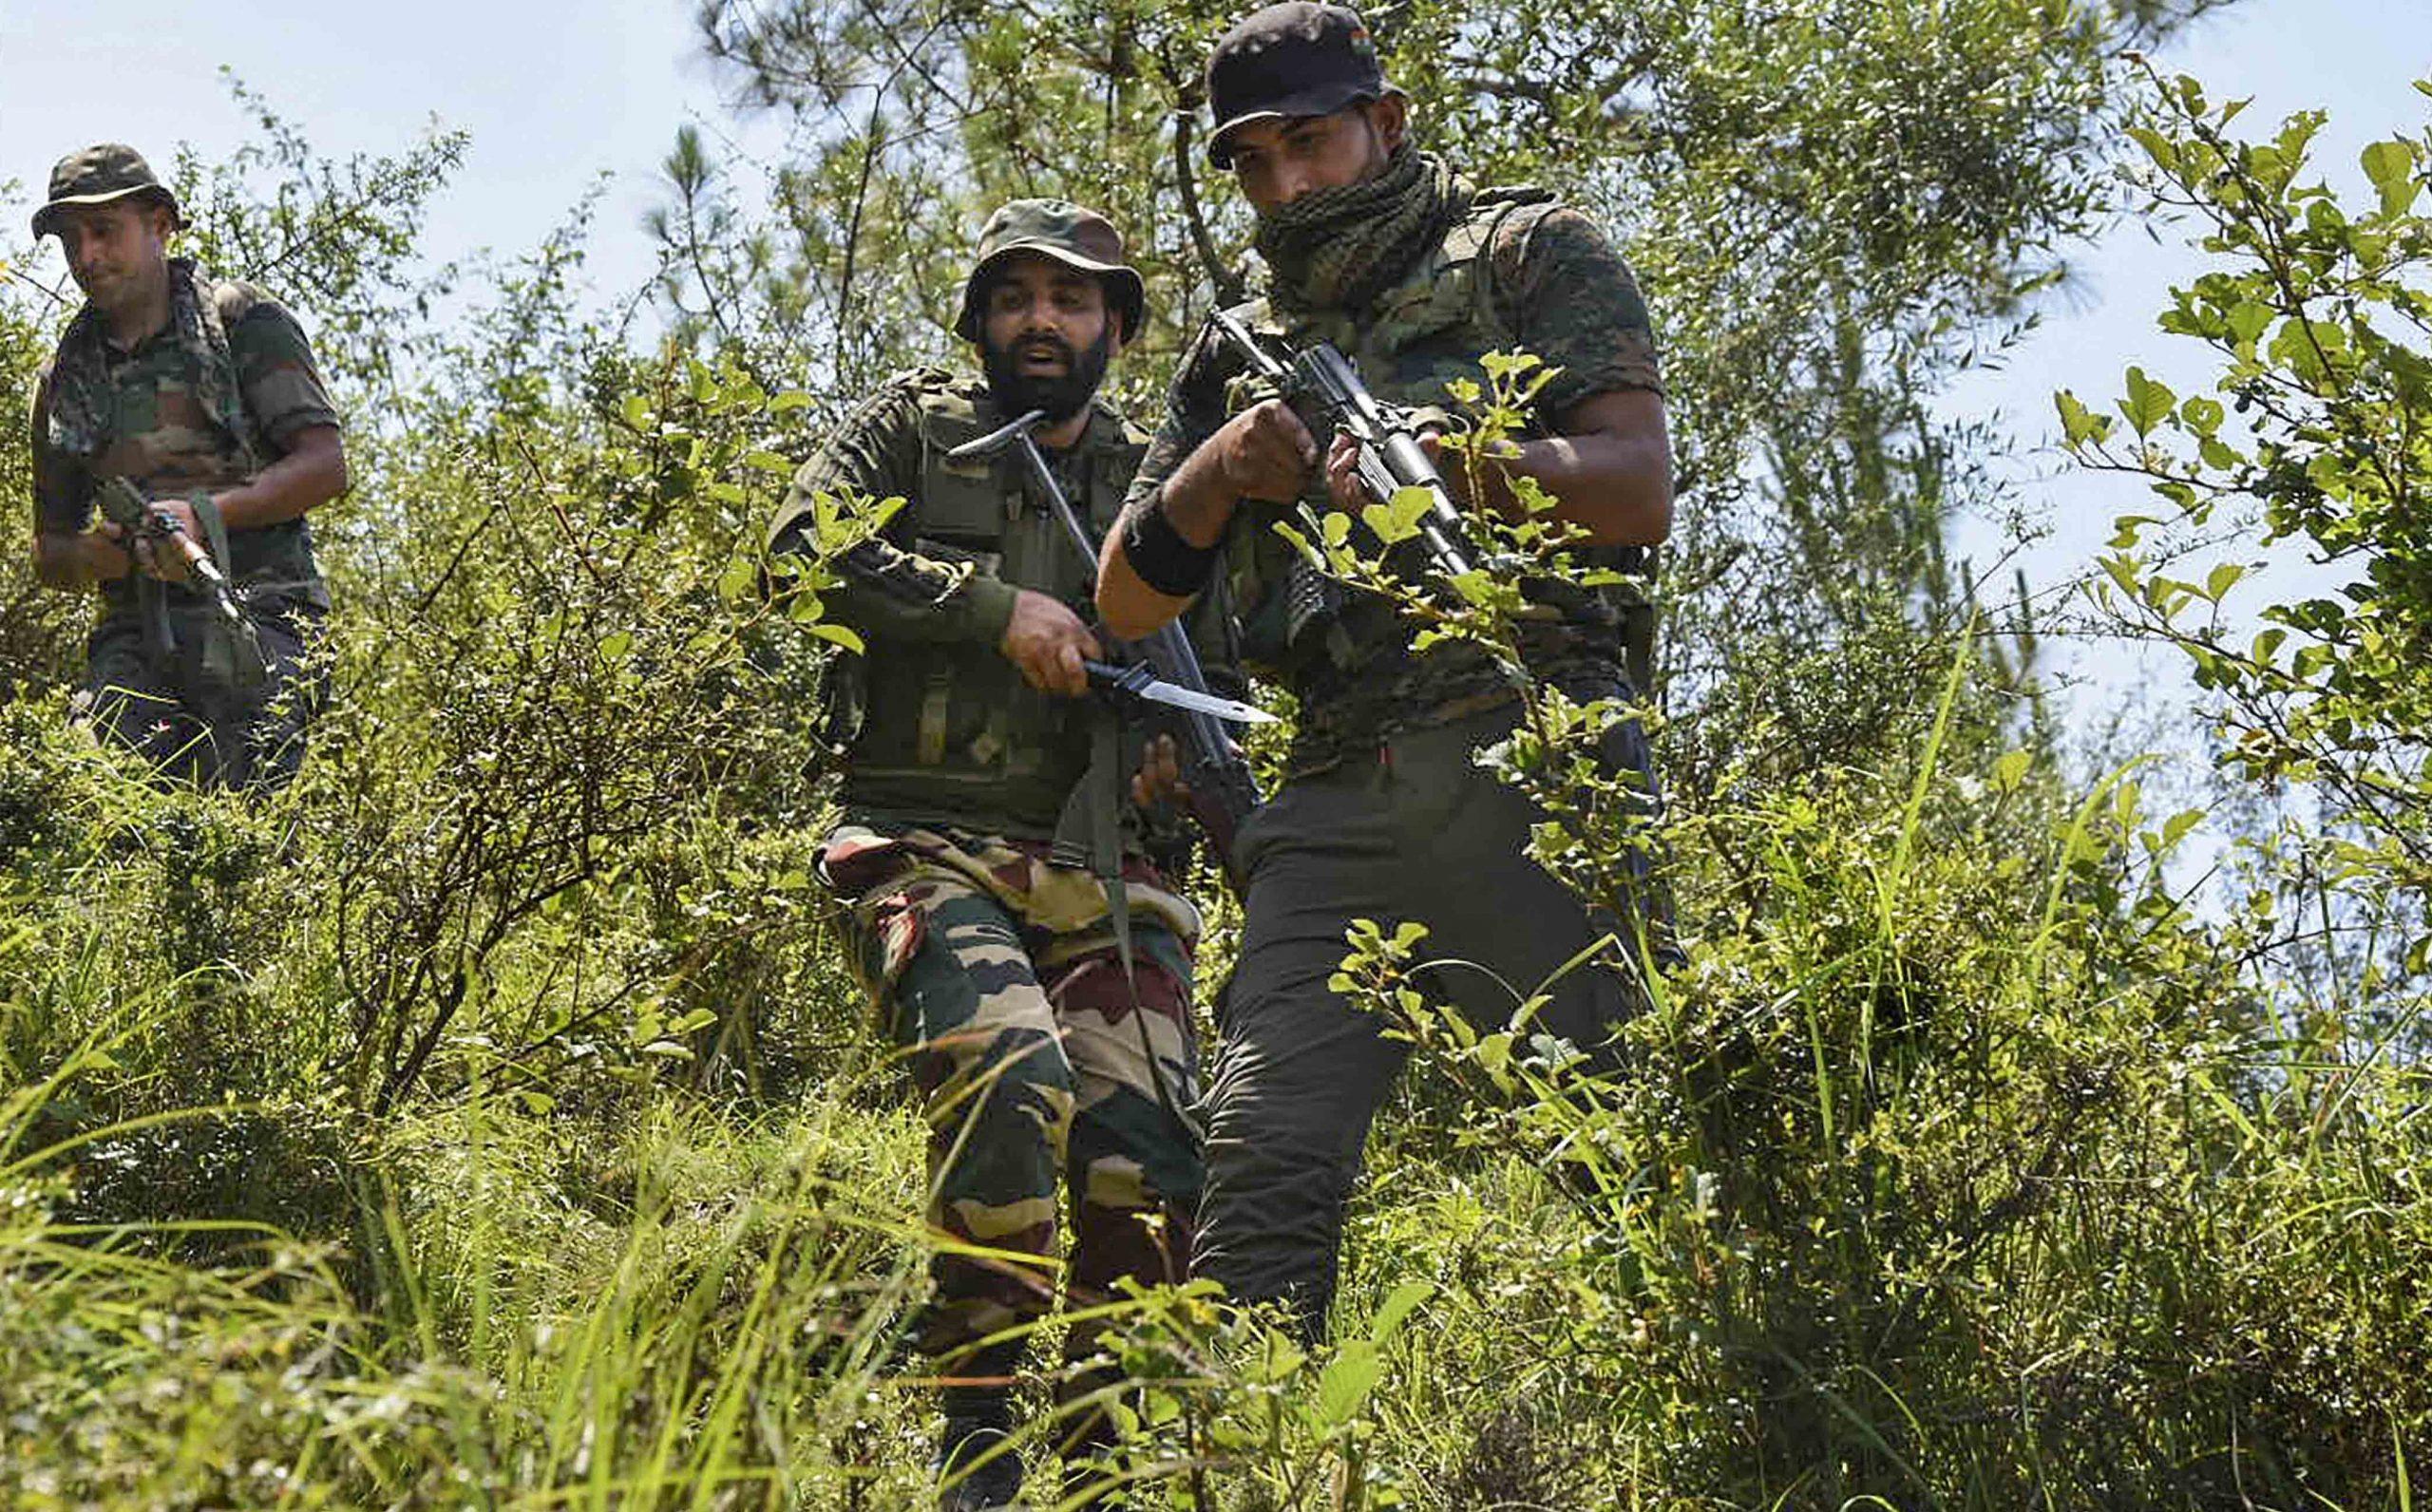 Narendra Modi condemns killing of 3 BJP workers in J&K by militants